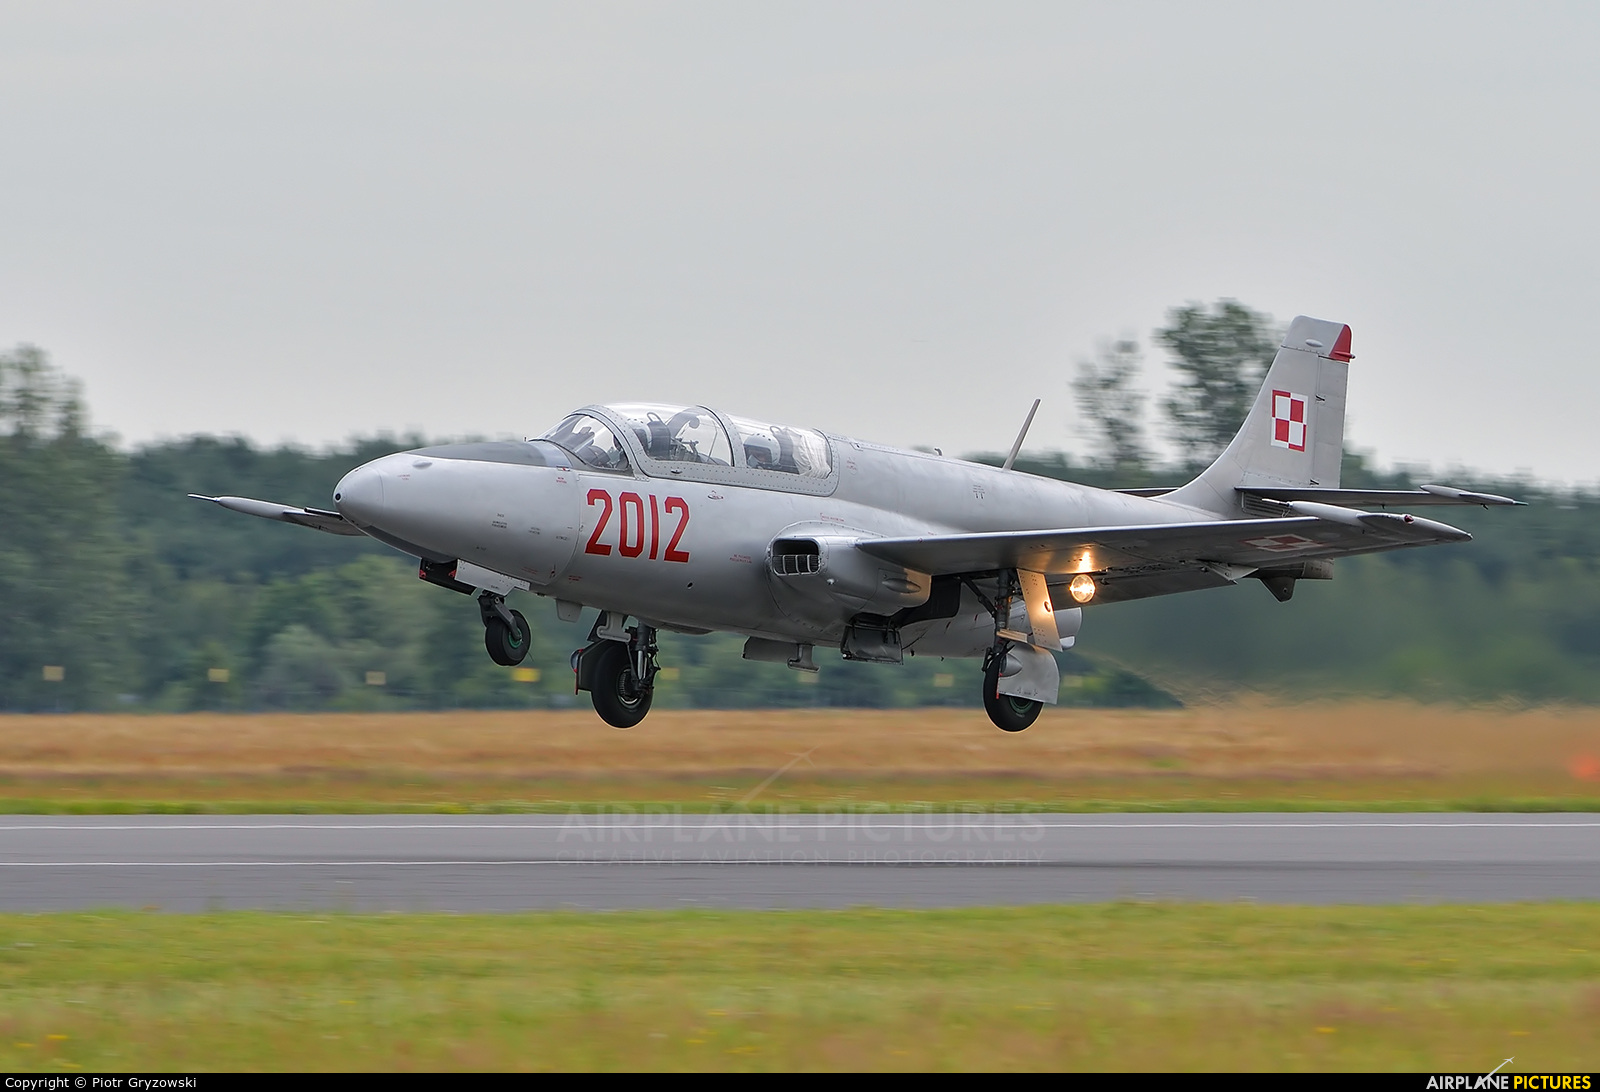 Poland - Air Force 2012 aircraft at Dęblin